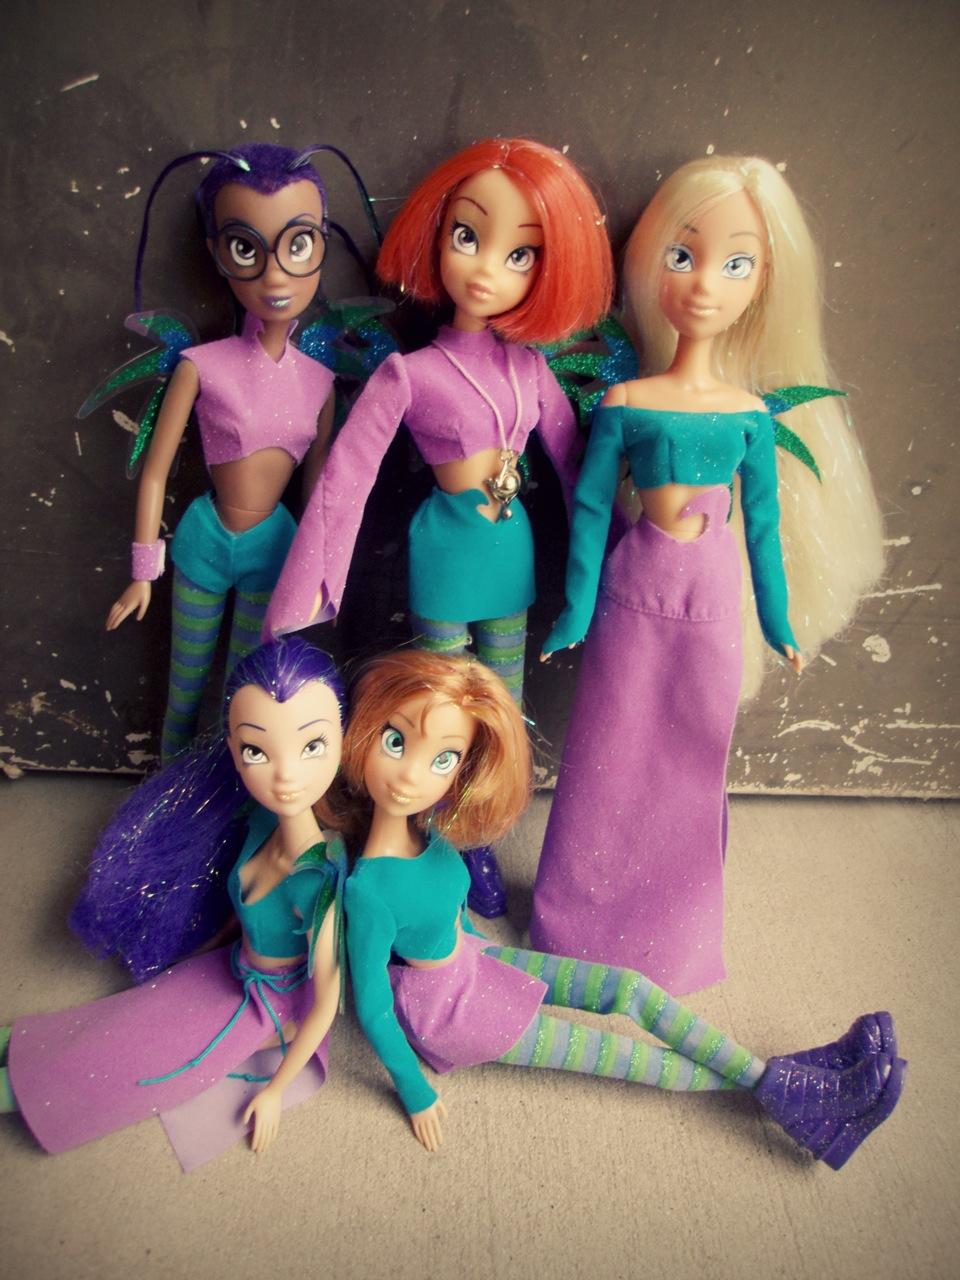 W.I.T.C.H. dolls